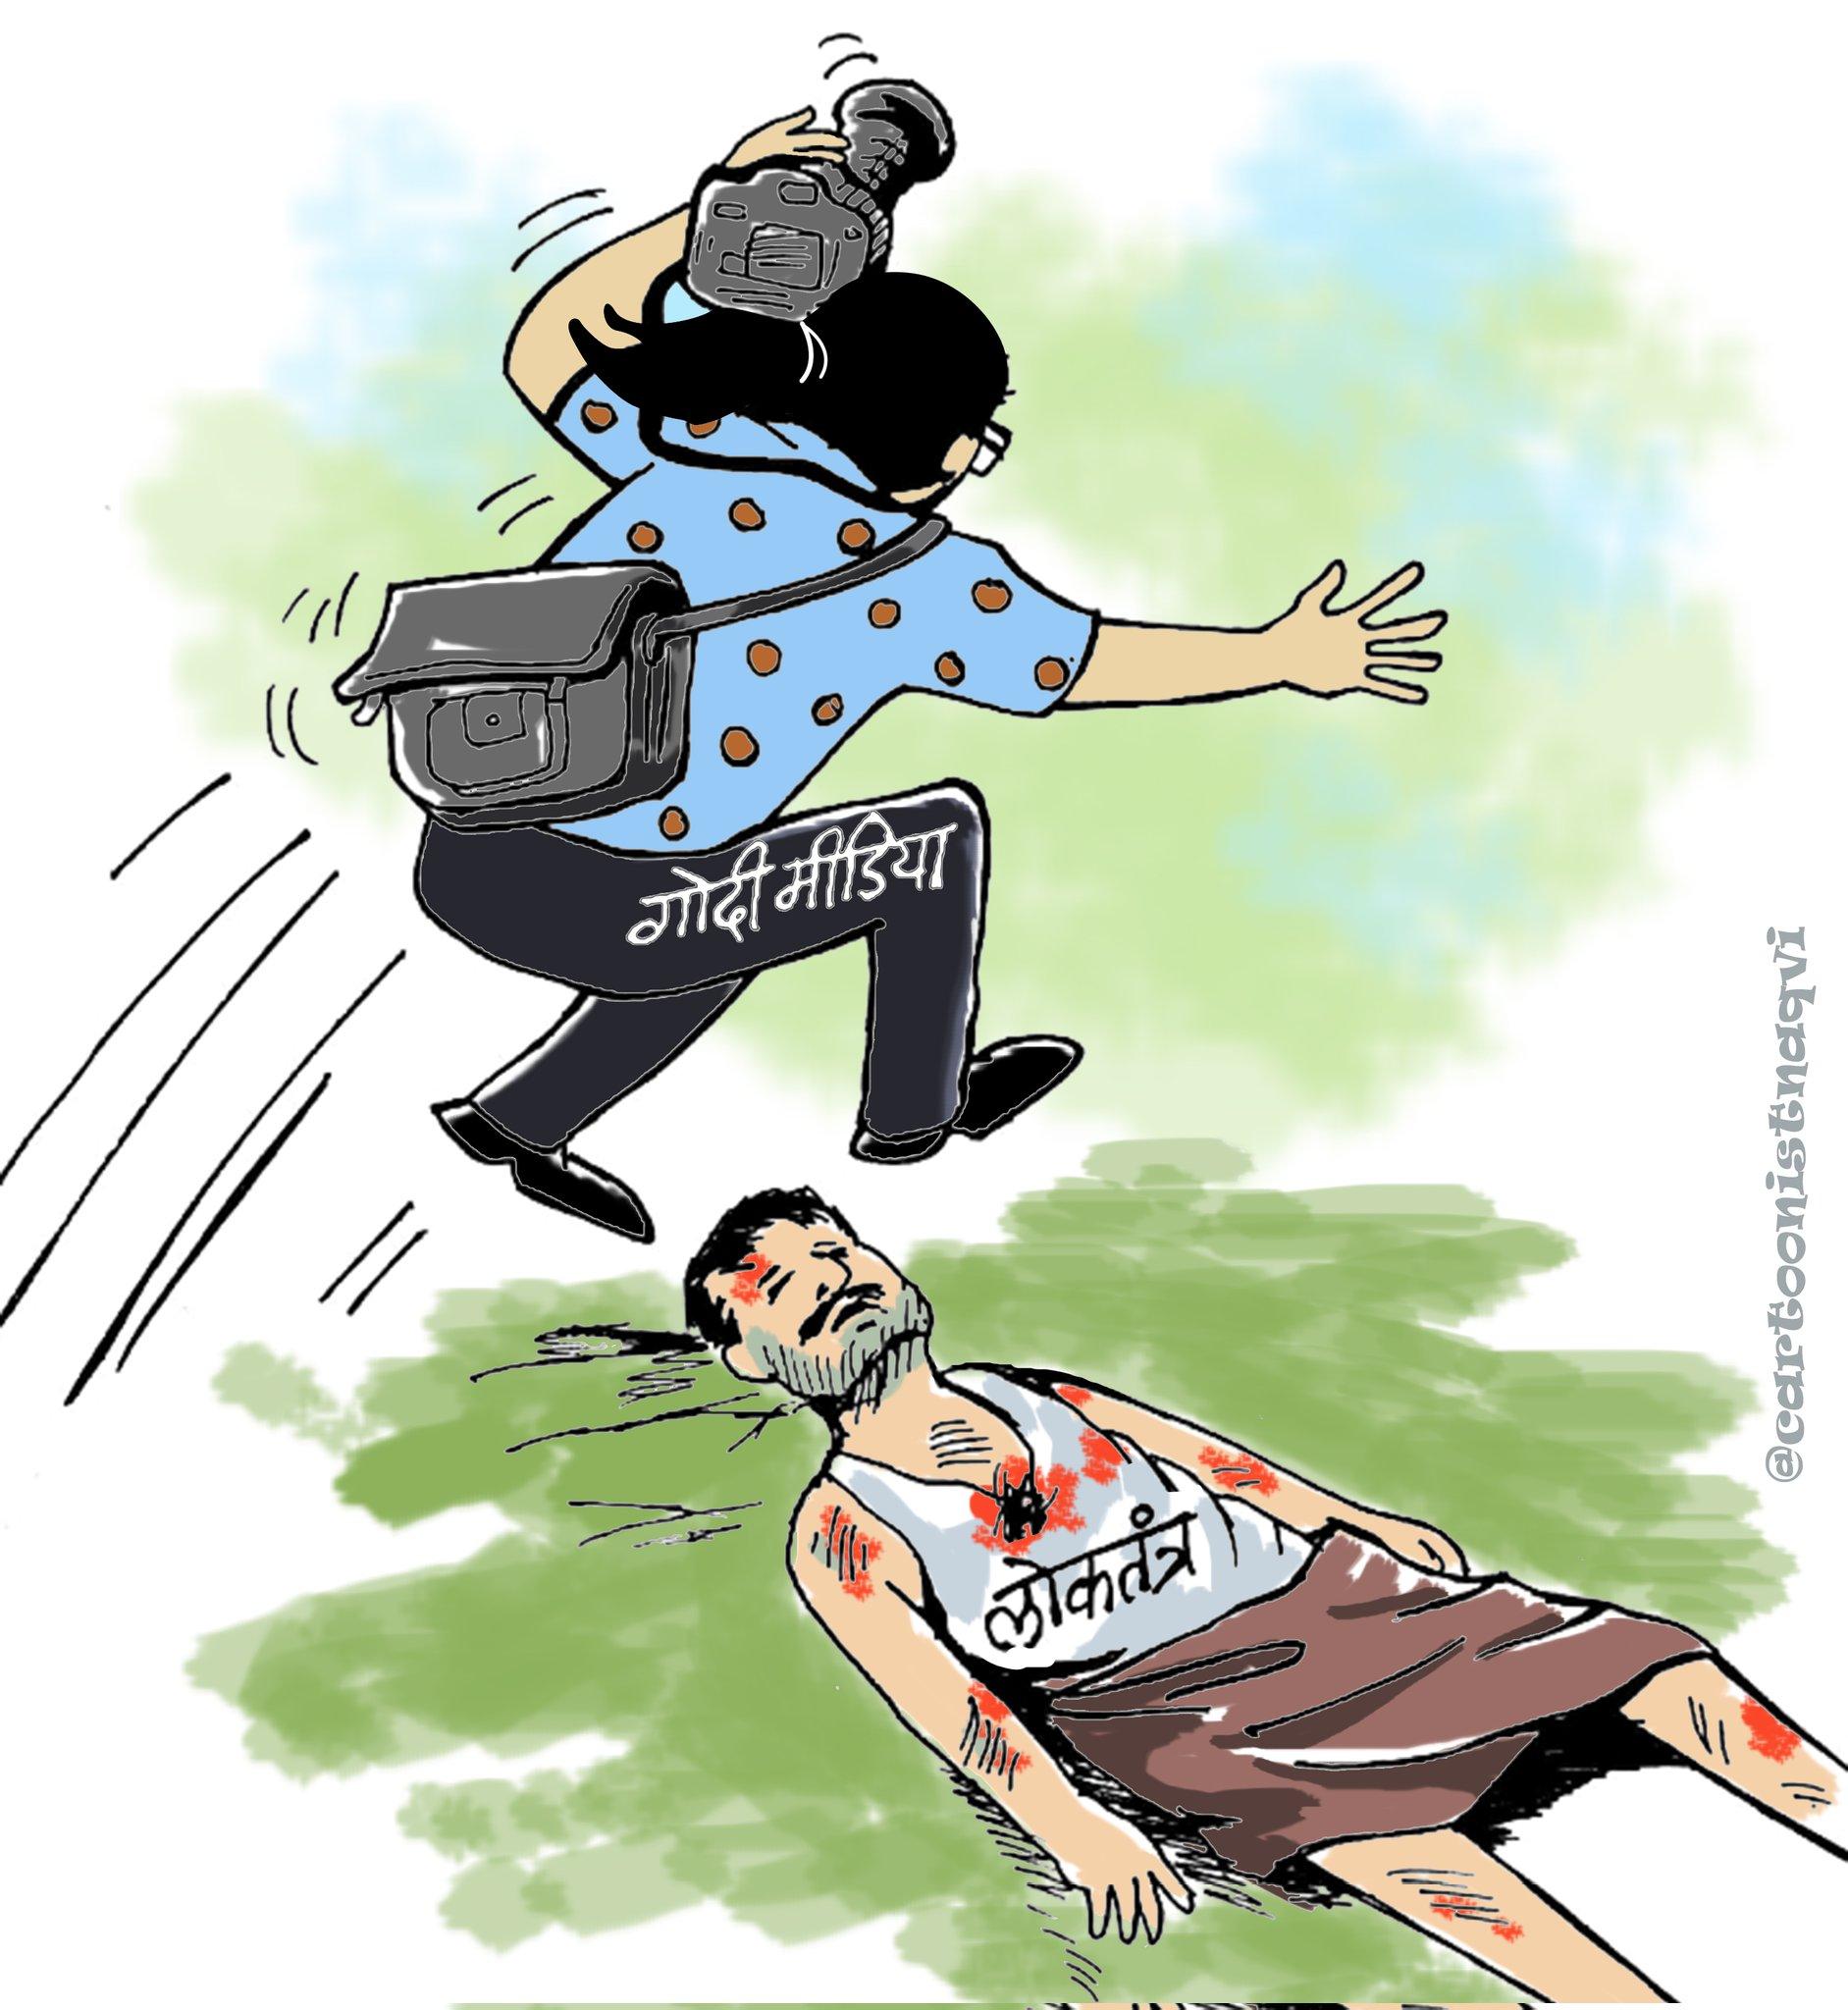 Assam, ExposeFakeMedia